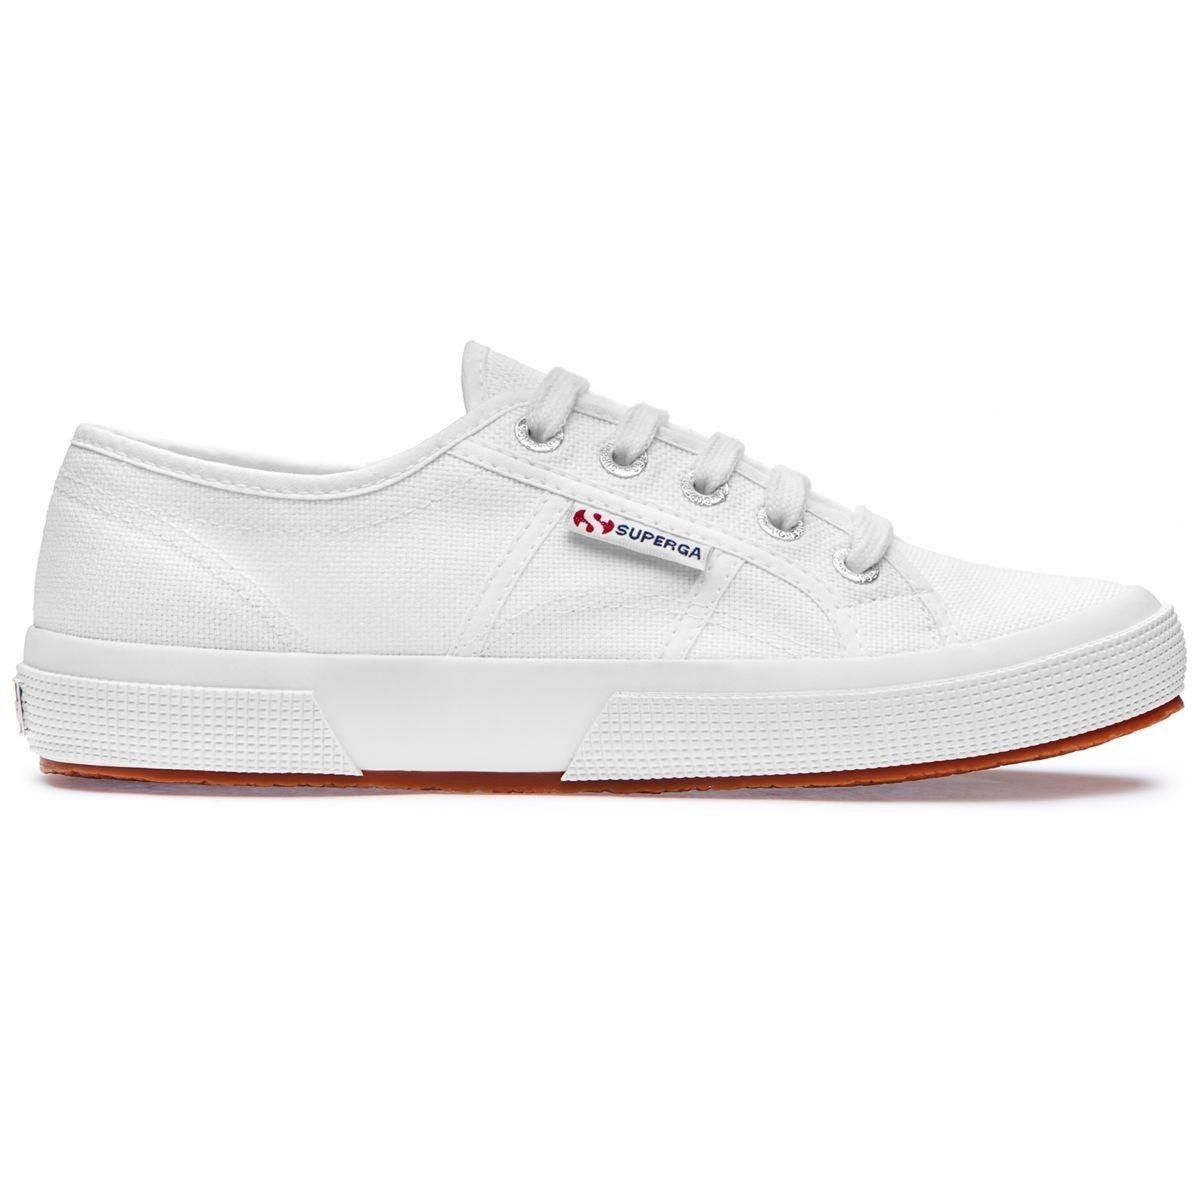 SUPERGA 2750 COTU CLASSIC S000010 shoes WHITE BIANCO 36 37 38 39 40 41 42 43 44